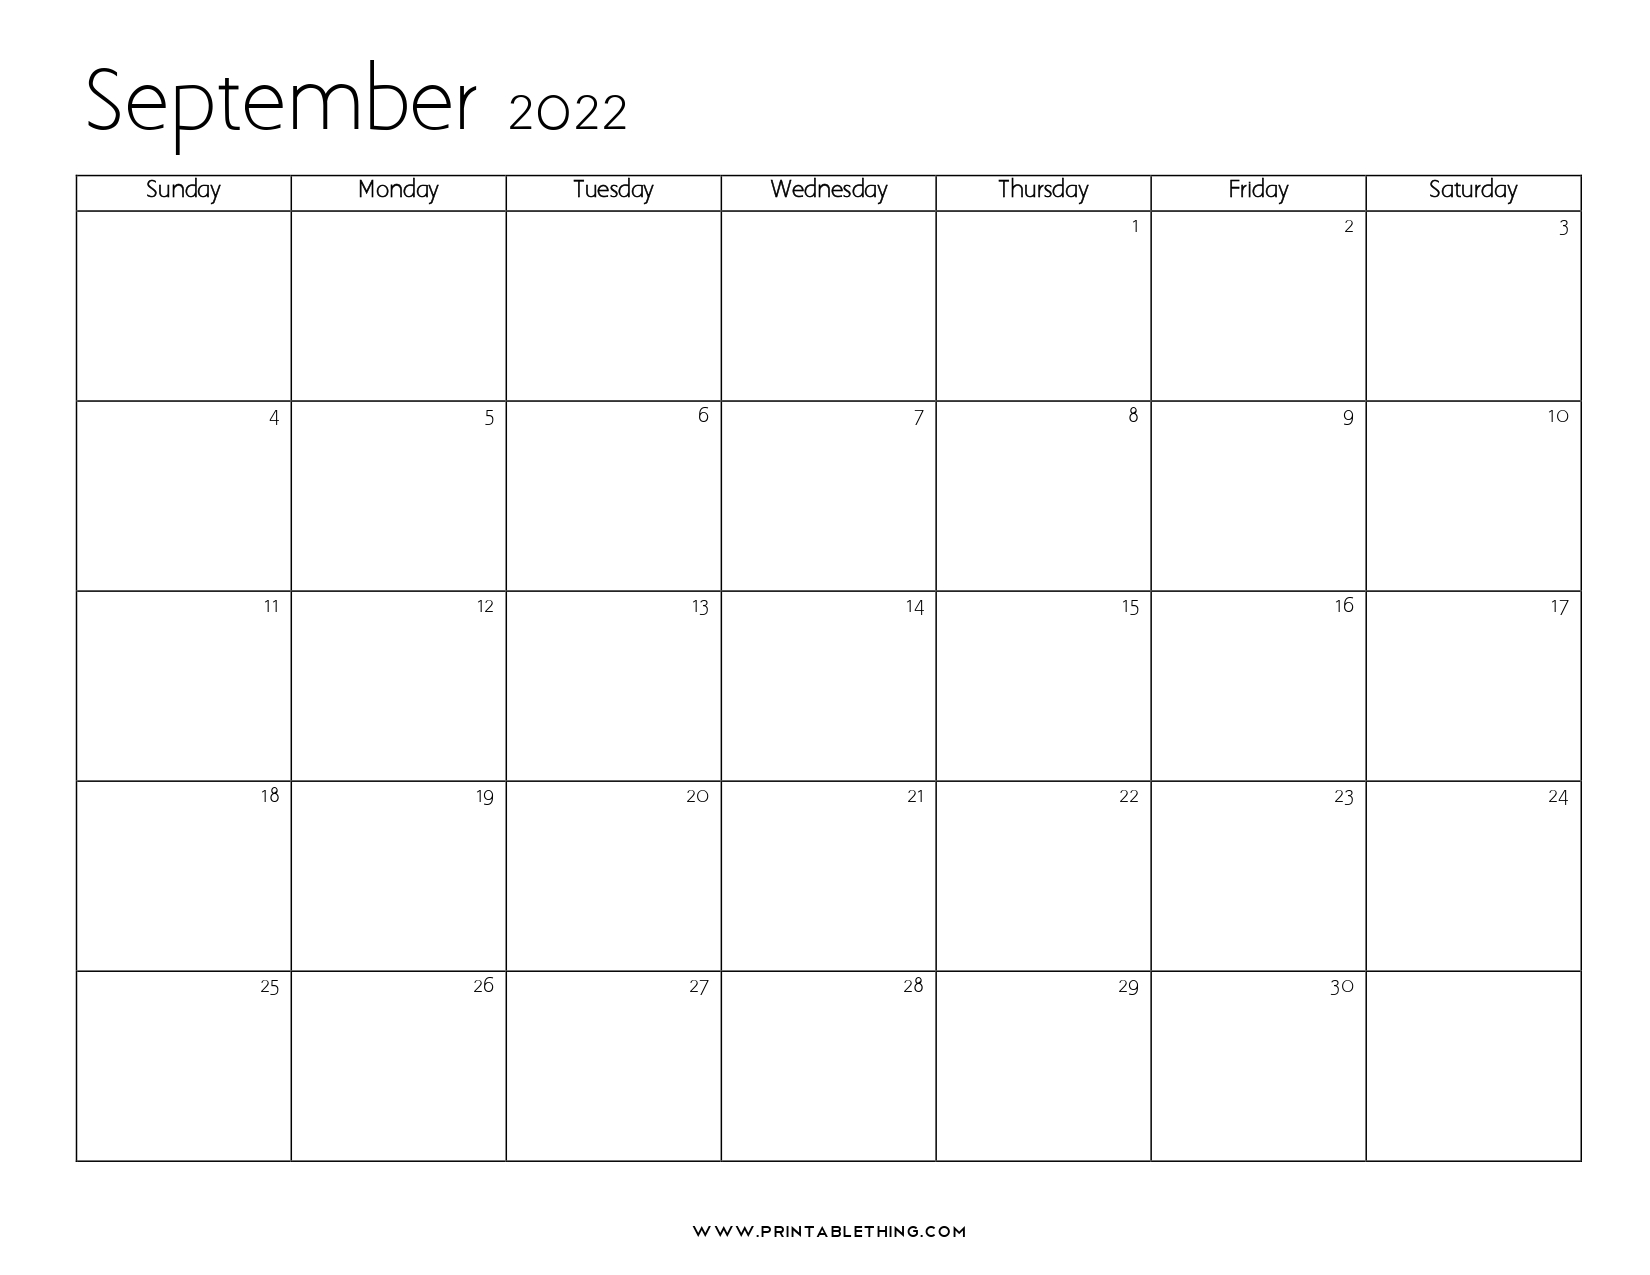 Blank September 2022 Calendar.20 September 2022 Calendar Printable Pdf Us Holidays Blank